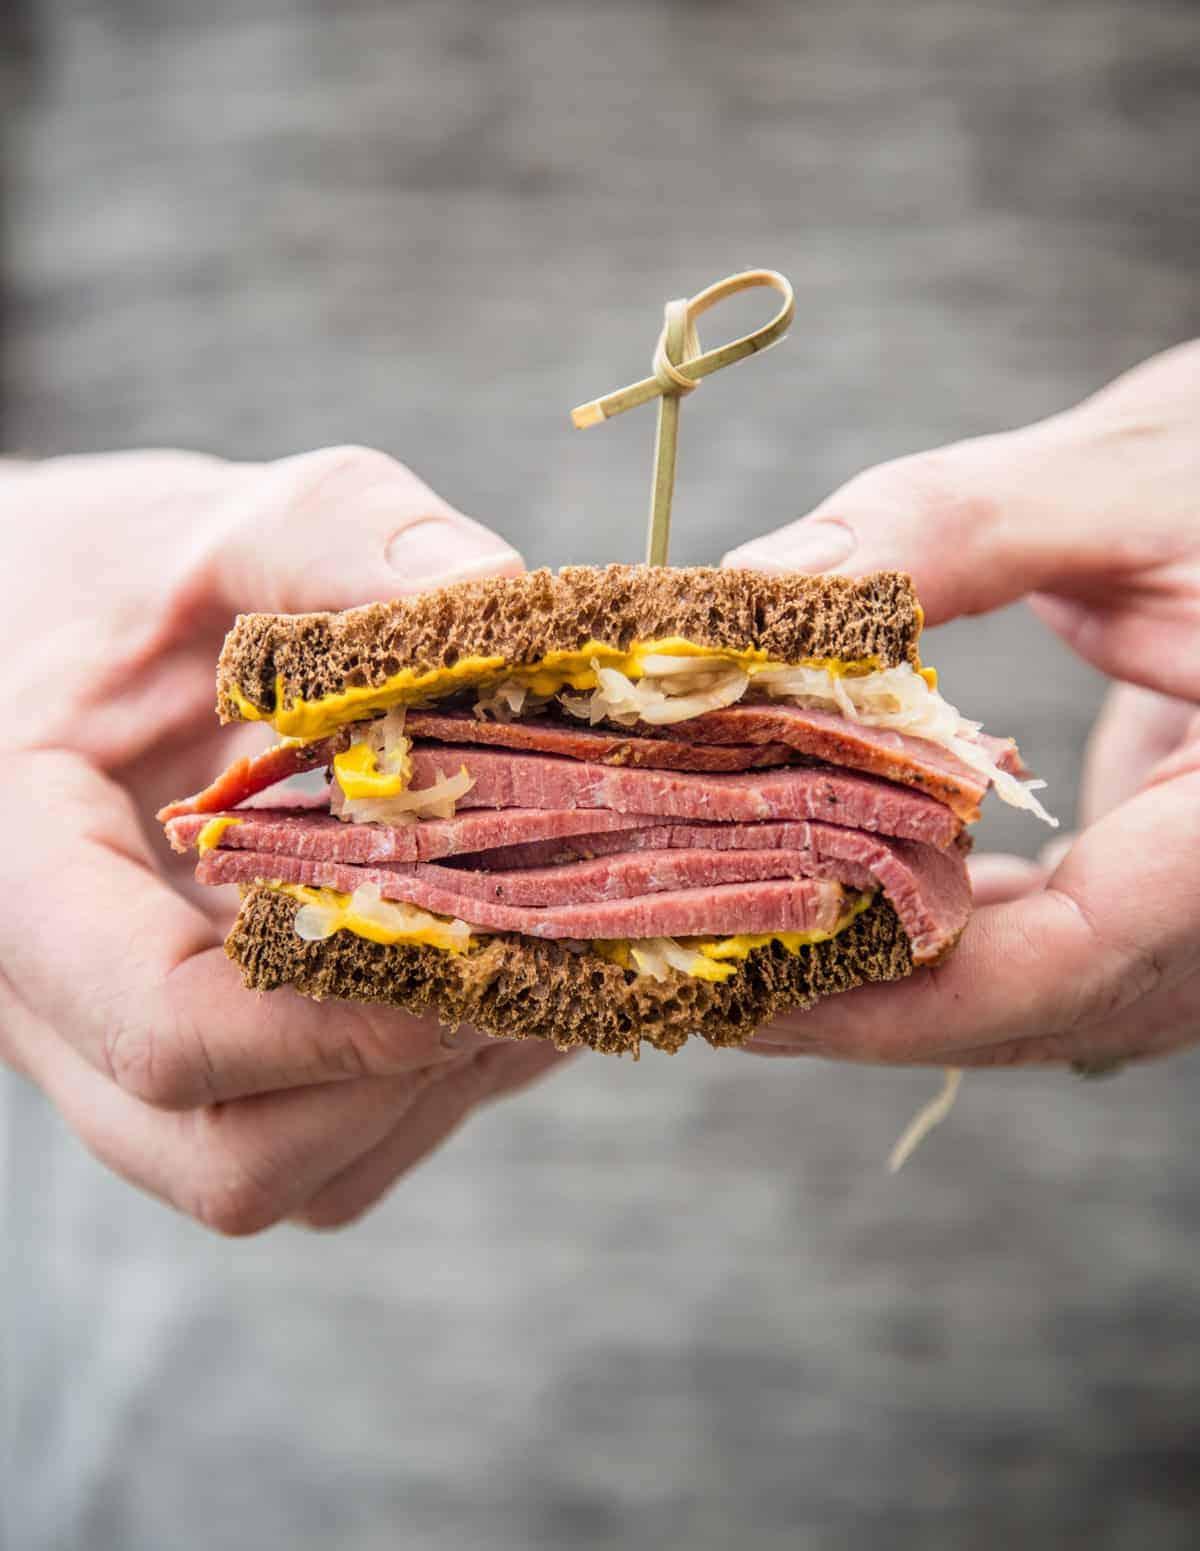 Holing a Smoked Corned Beef Sandwich